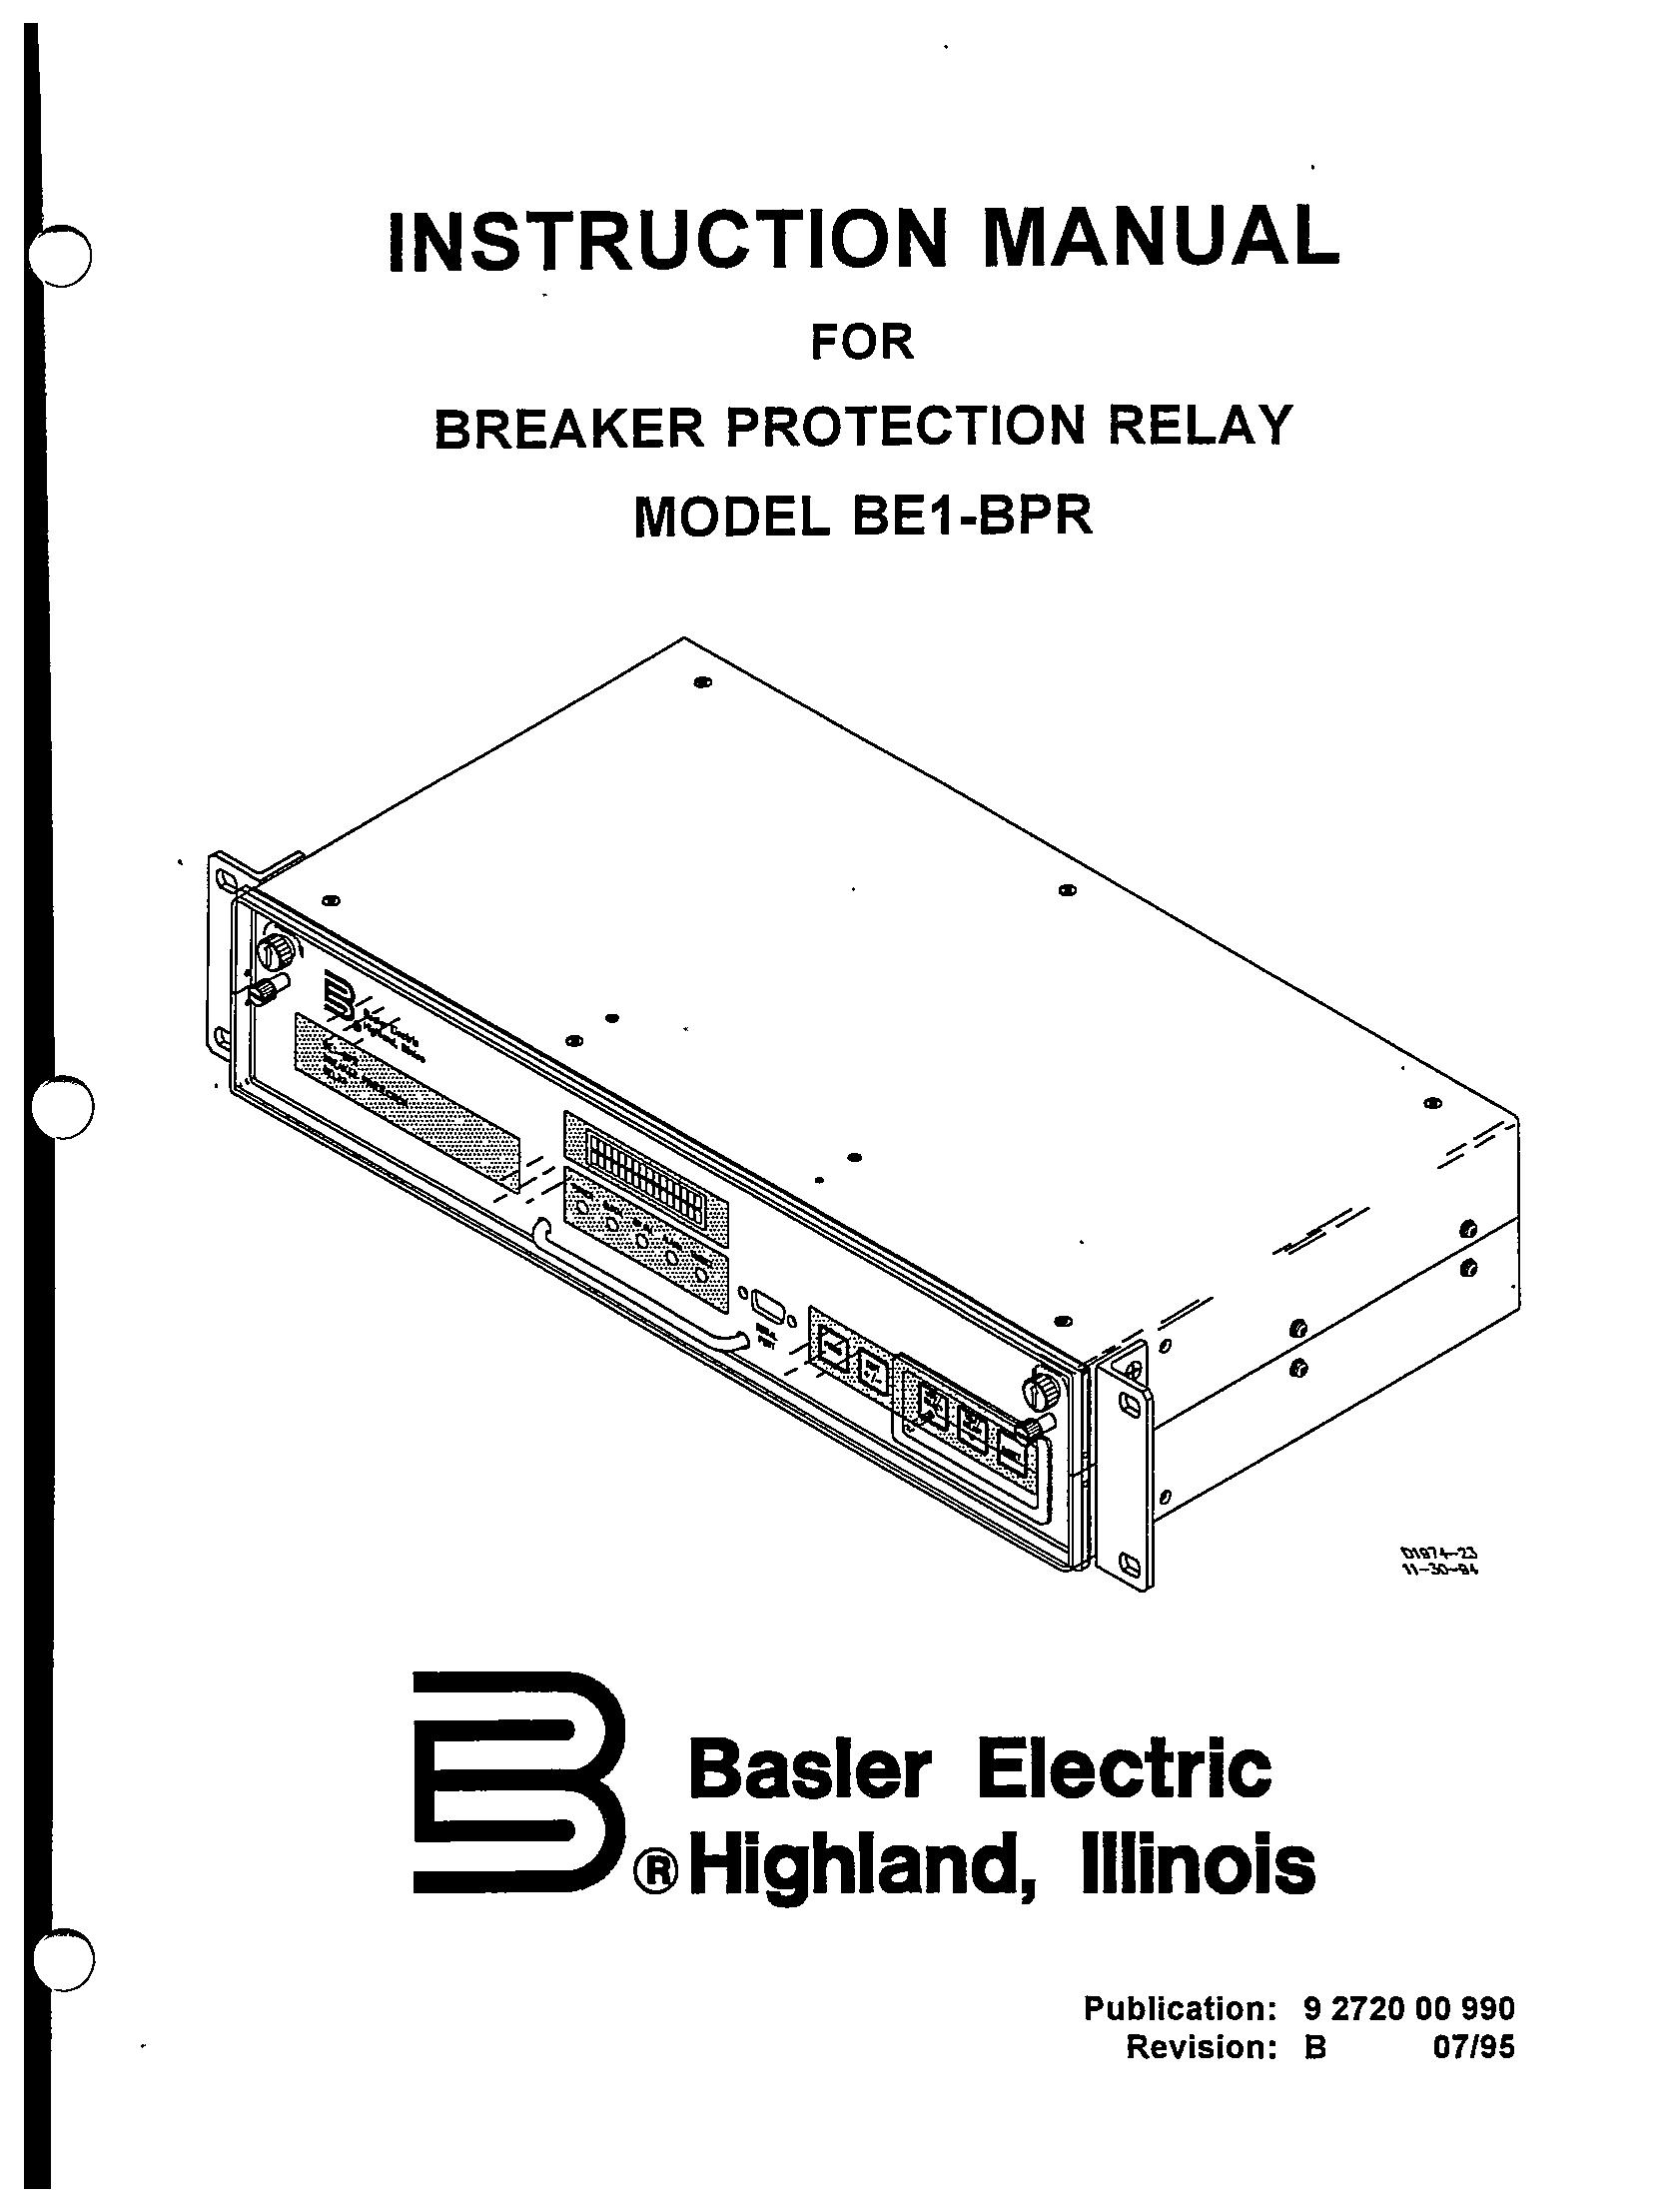 Breaker Protection Relay Model Be1 Bpr Revision B Manual